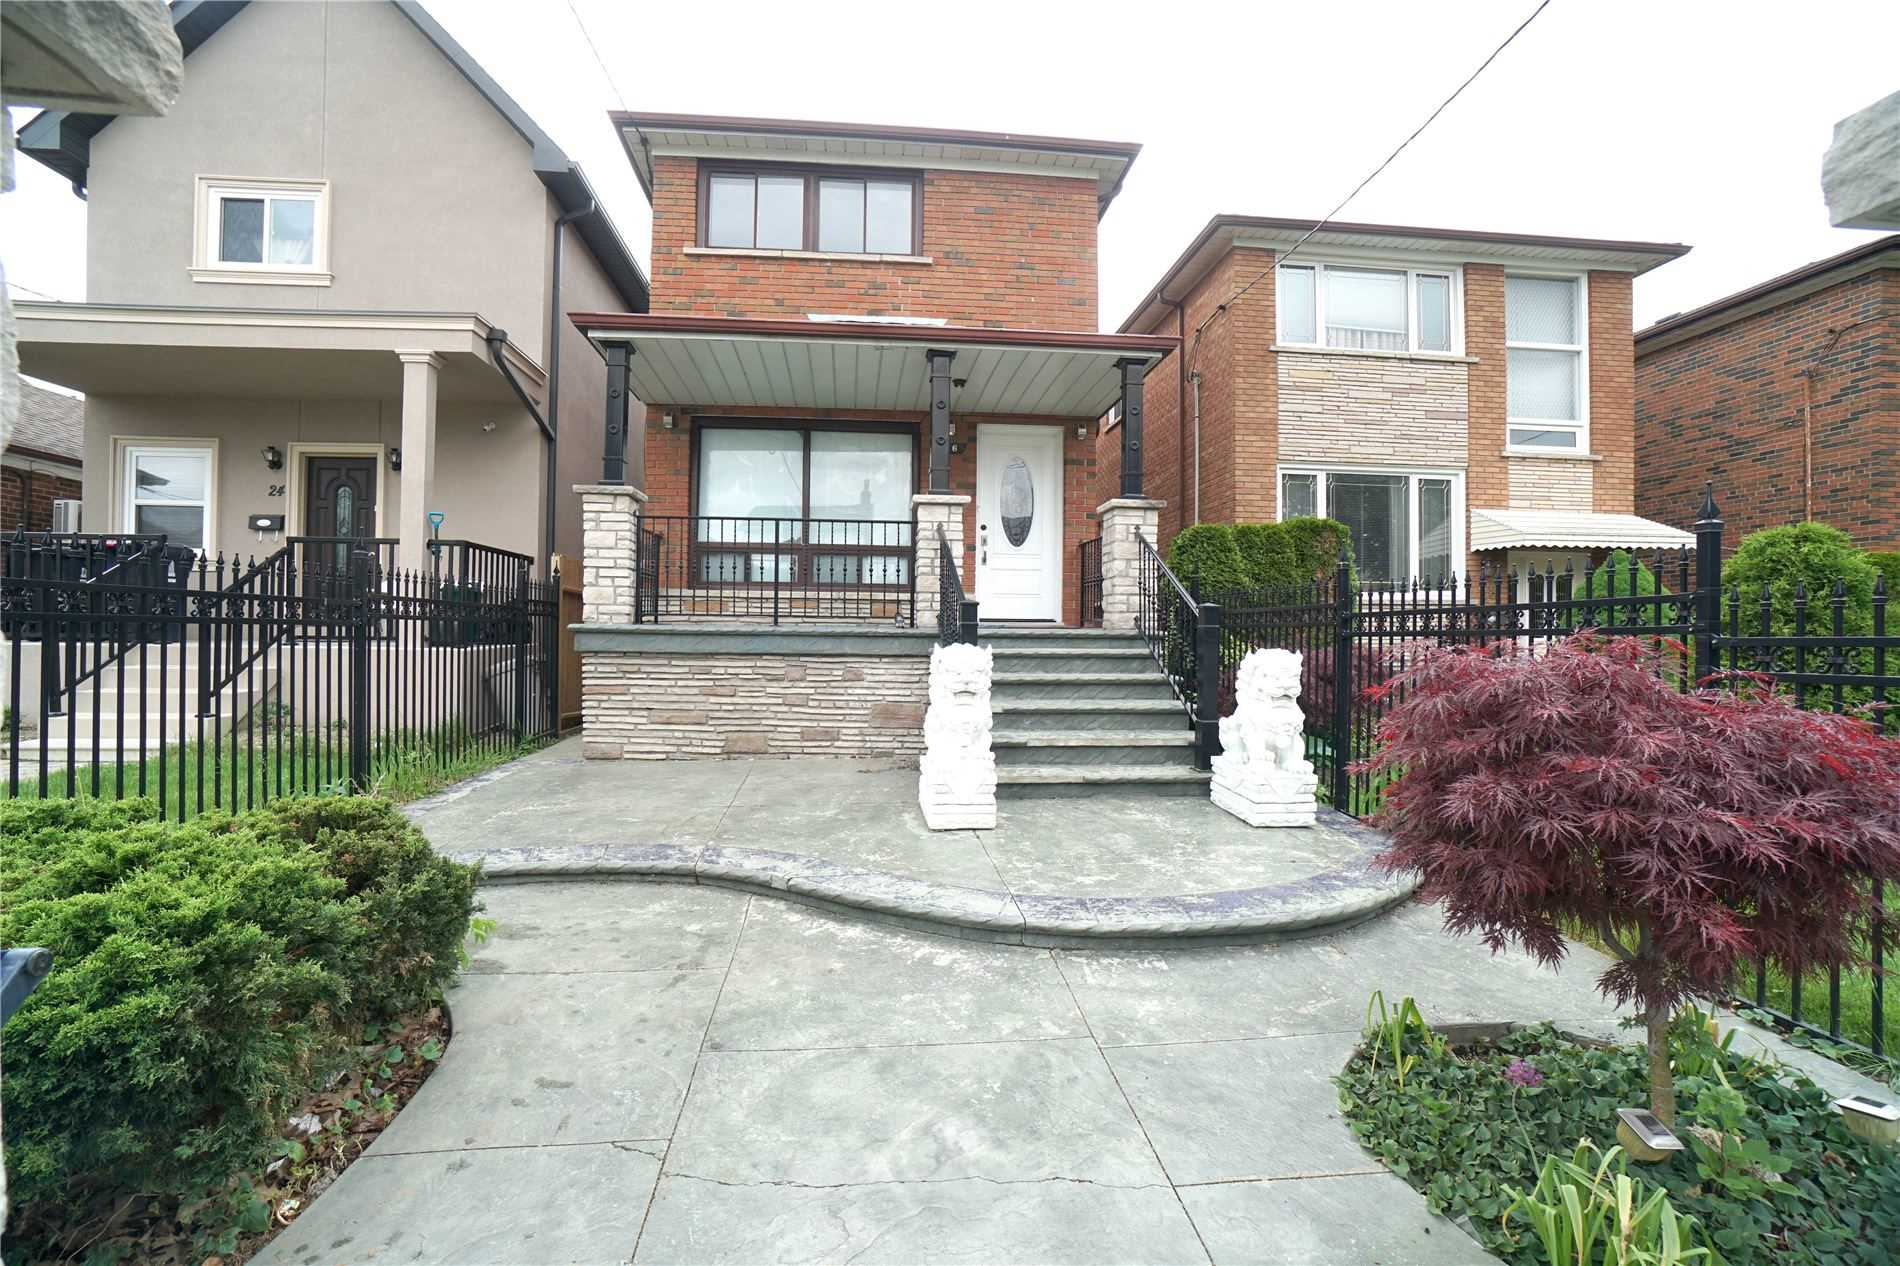 26 Lapp St, Toronto, Ontario M6N3W6, 3 Bedrooms Bedrooms, 6 Rooms Rooms,3 BathroomsBathrooms,Detached,For Sale,Lapp,W5363608